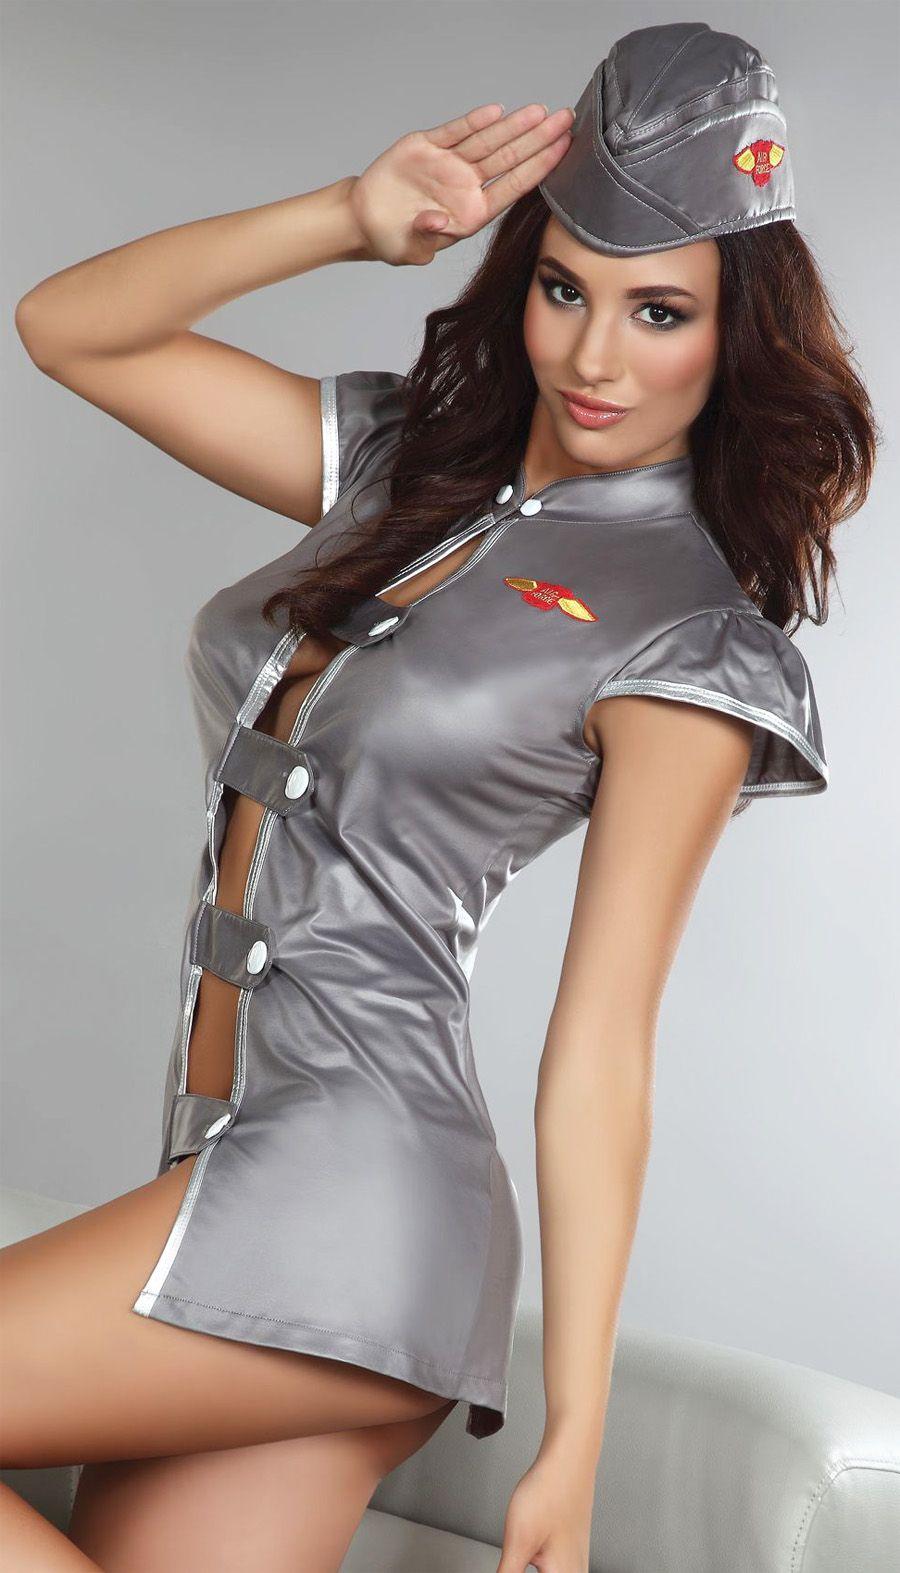 Pin on sexy uniforms